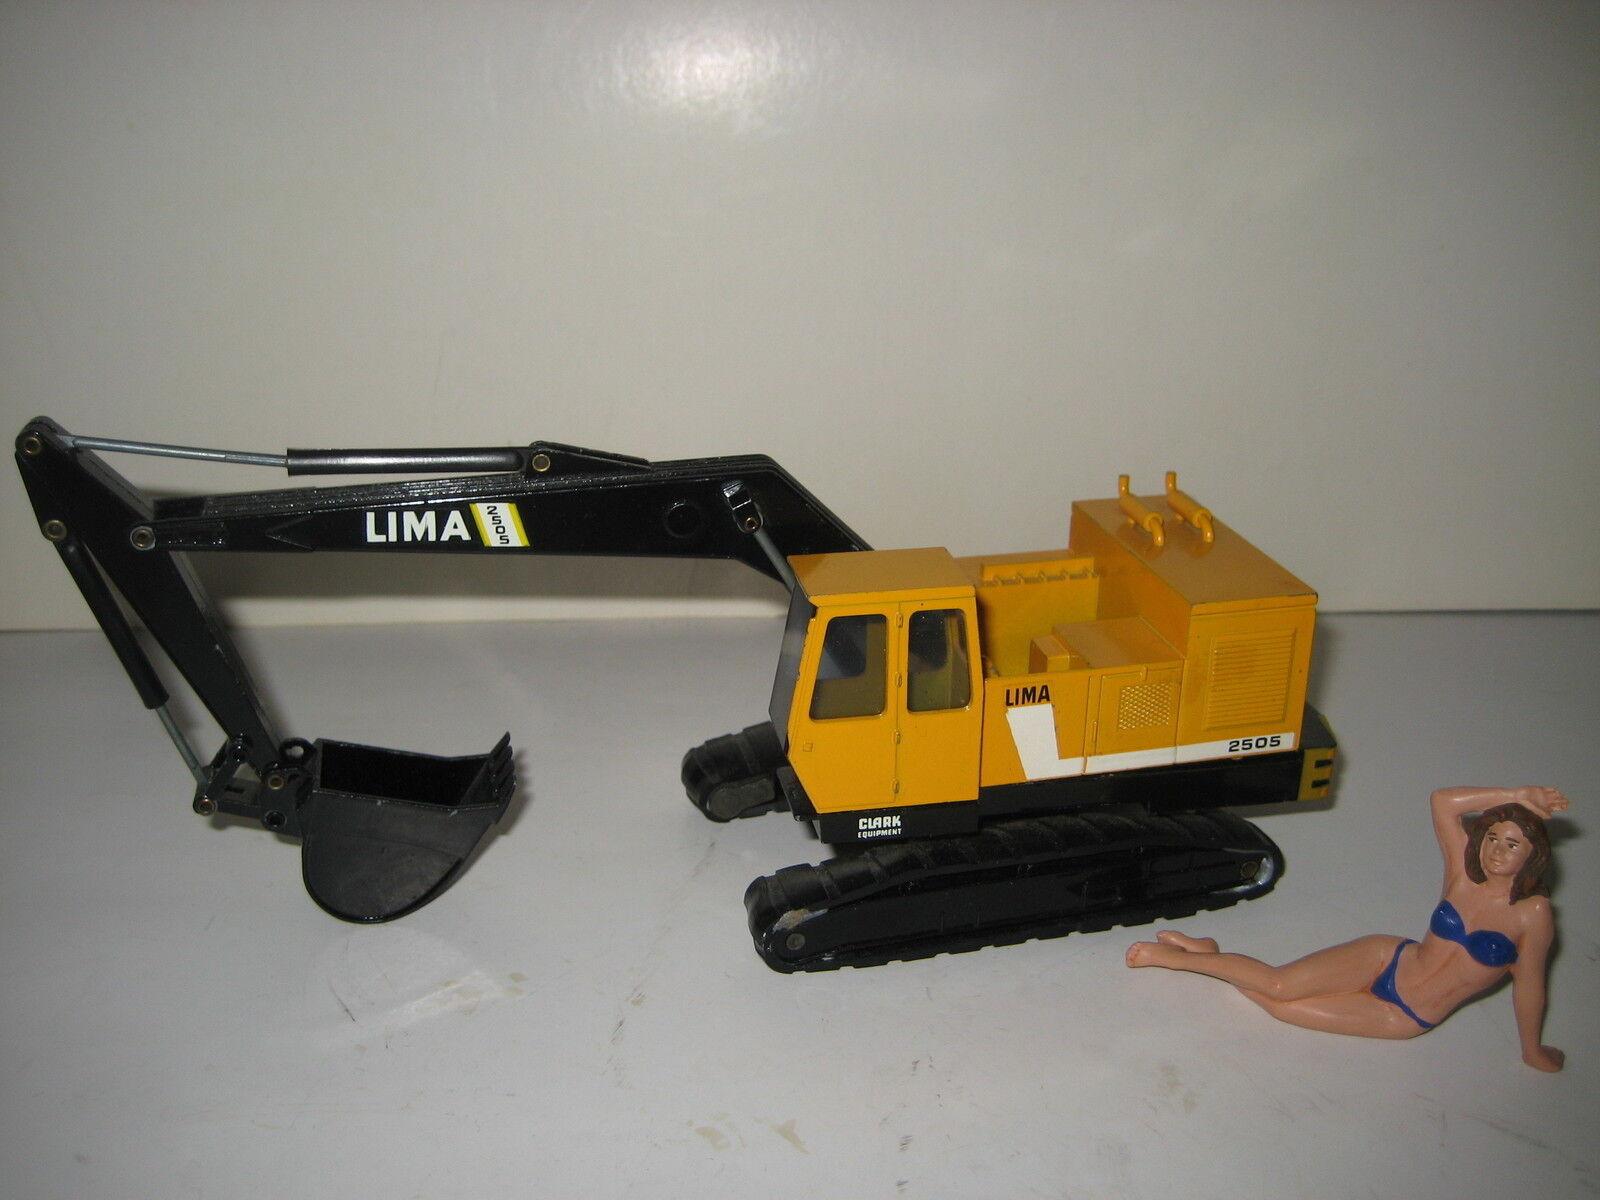 Clark Lima 2505 Excavator Bucket Tracked Excavators  147 Nzg 1 50